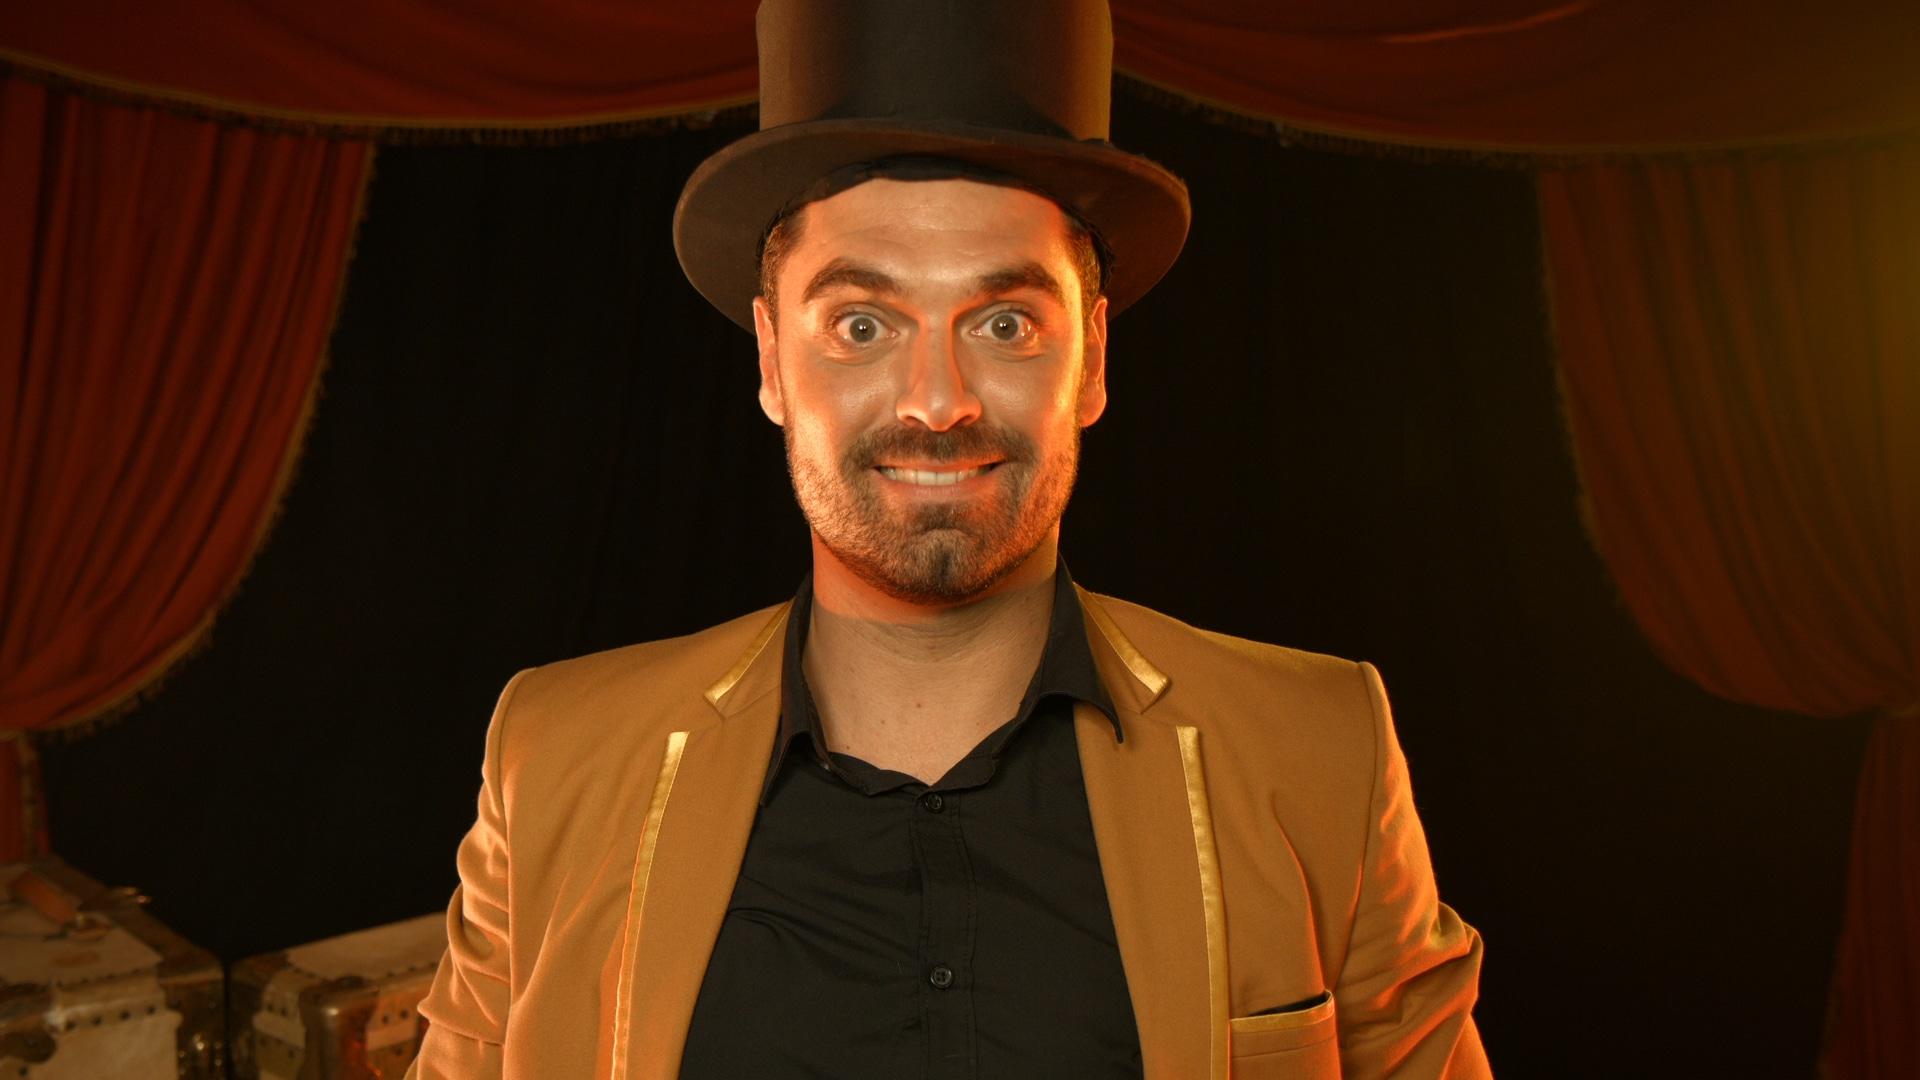 magicien professionnel - Harry Covert